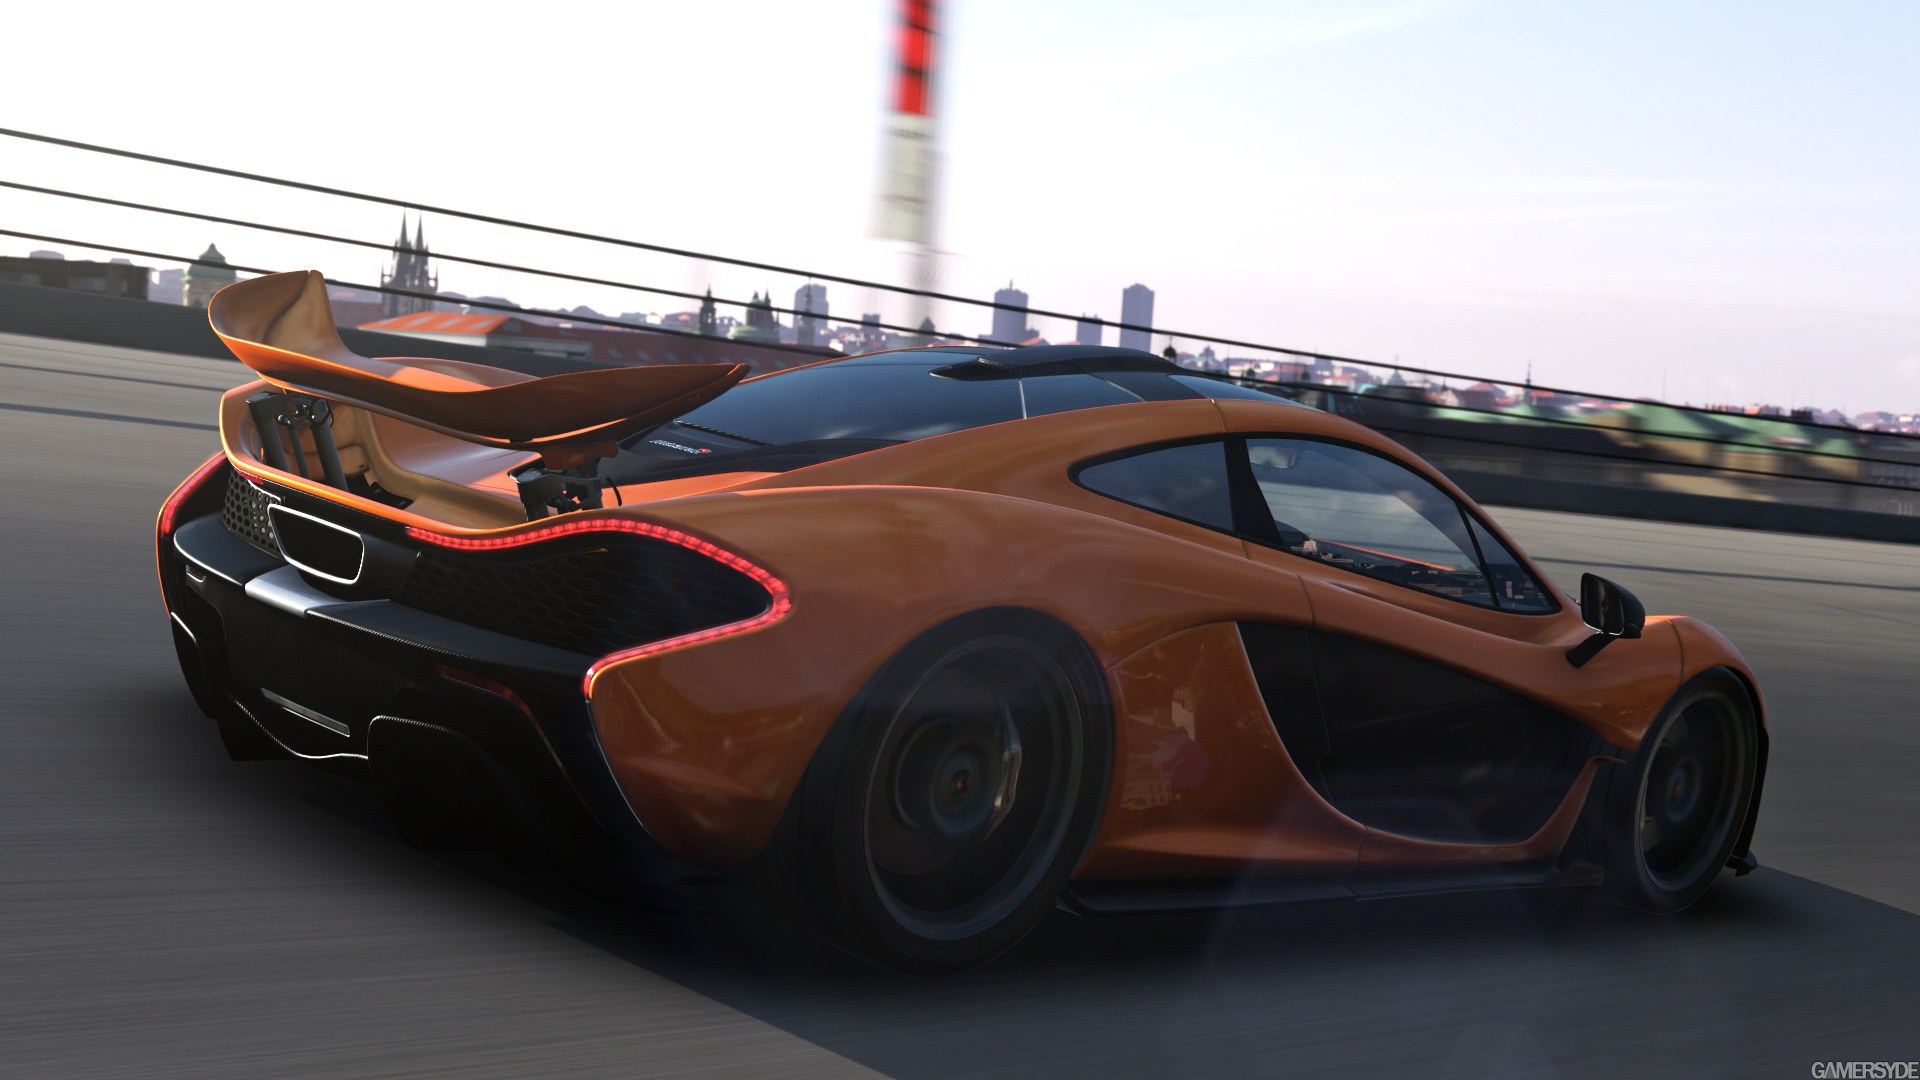 forza motorsport 5 mclaren p1 previews sim racing news. Black Bedroom Furniture Sets. Home Design Ideas